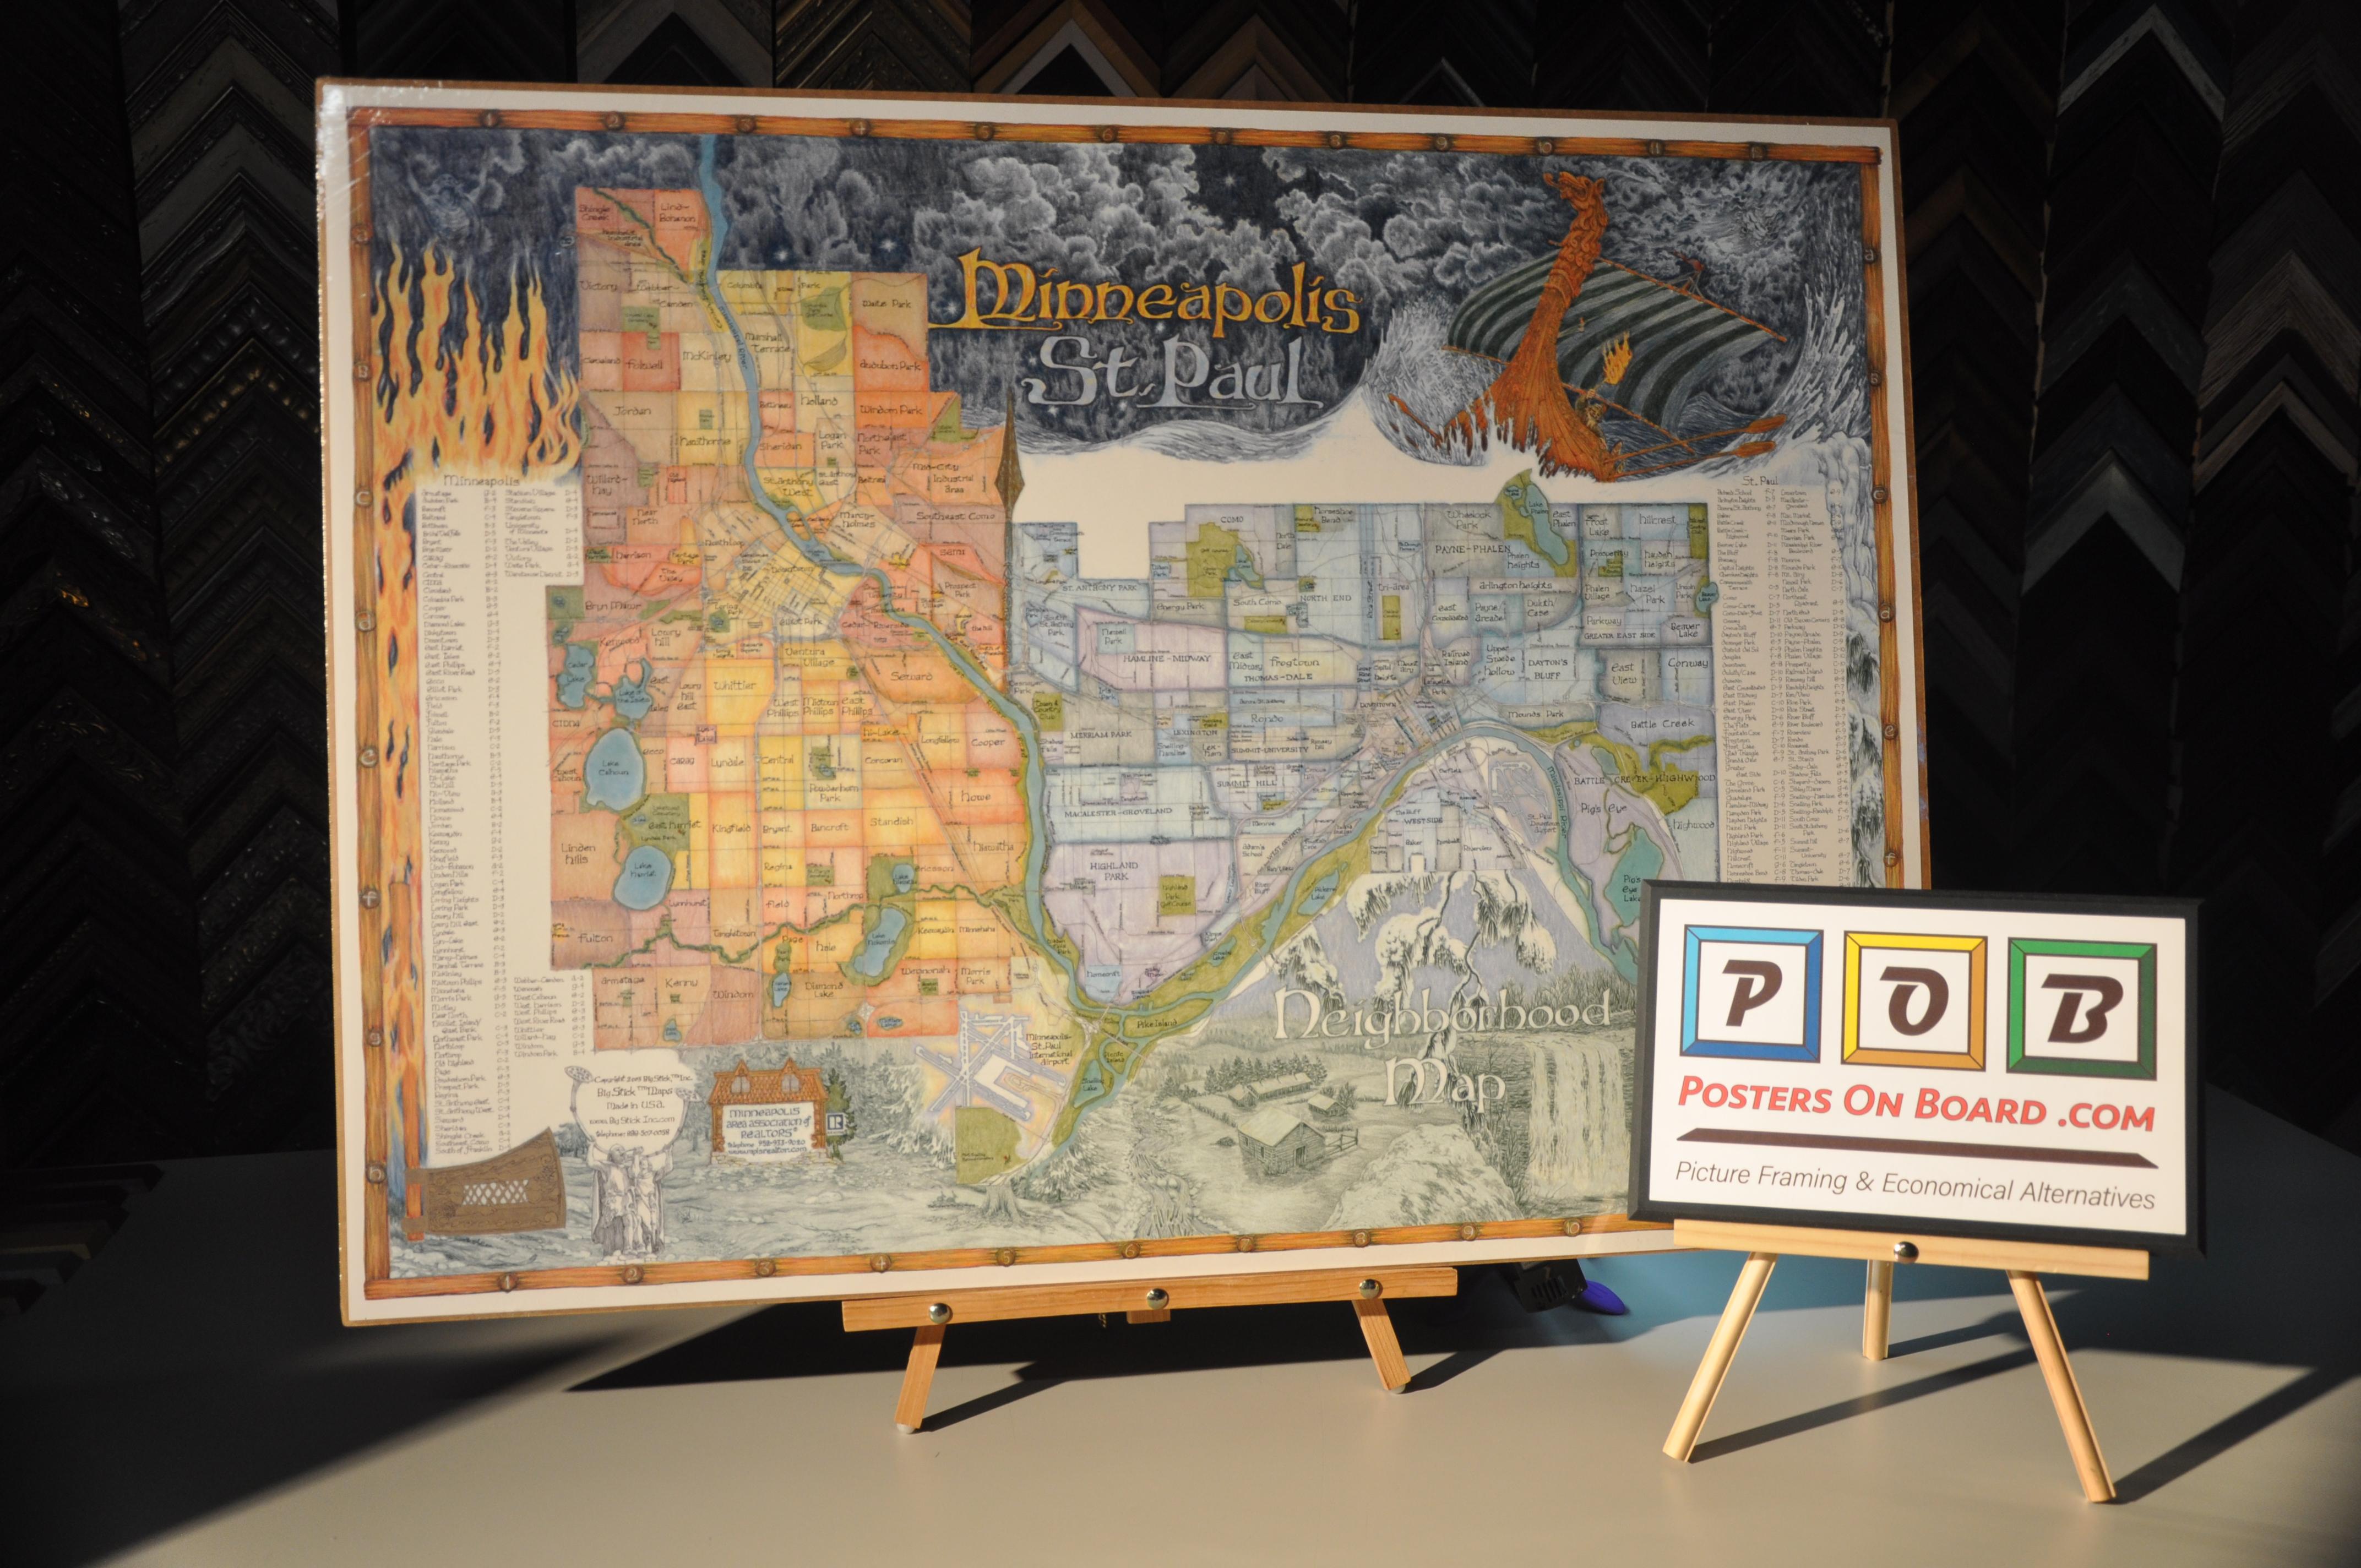 PostersOnBoard.com, Twin Cities